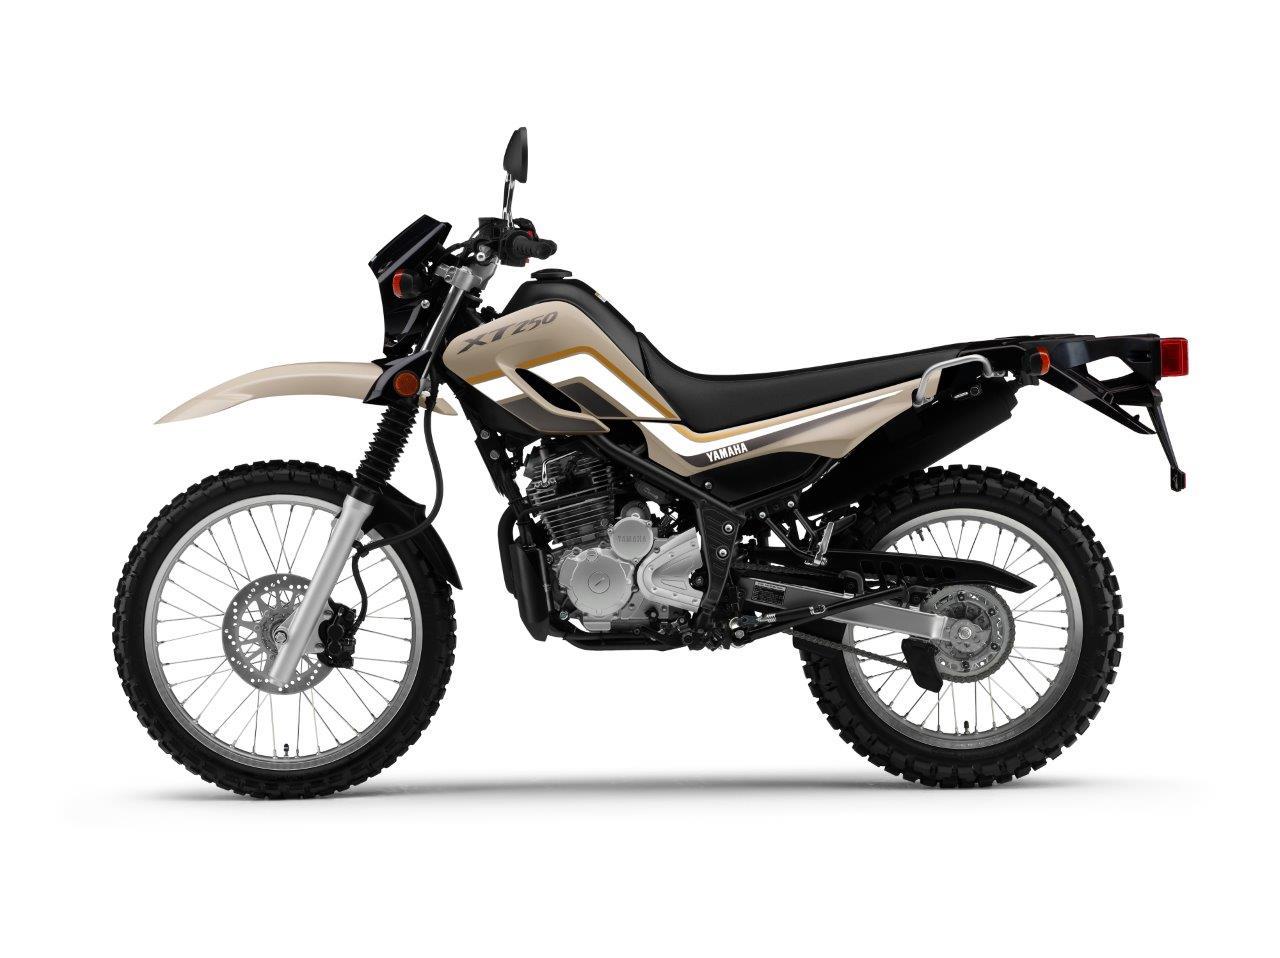 Yamaha Xt250 Model Overview